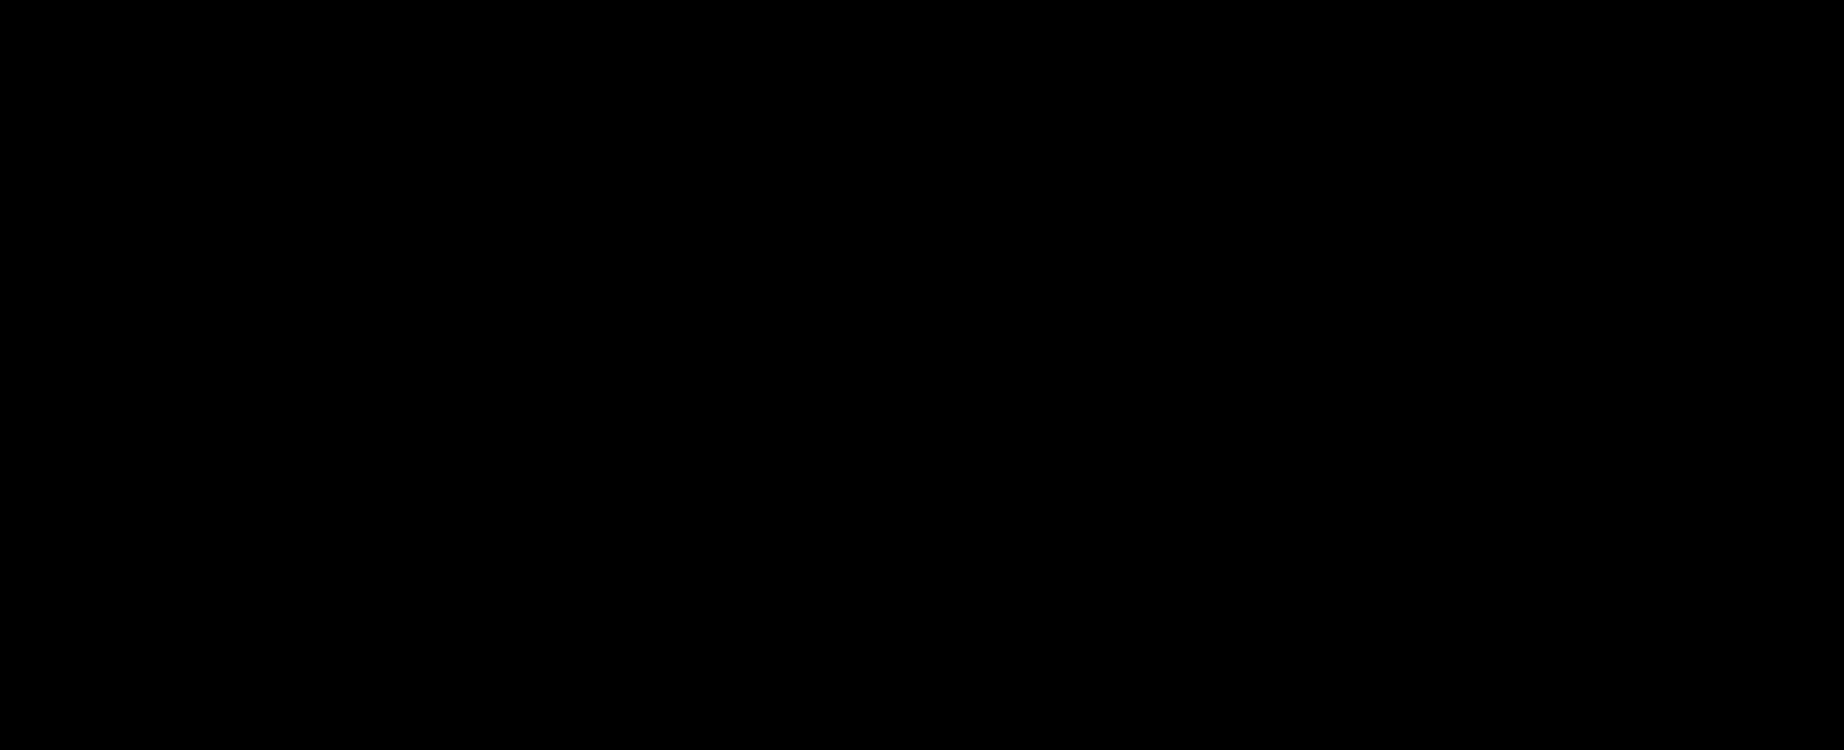 Light Emitting Diode Electronic Symbol Electronics Circuit Components Symbols Pinterest Component